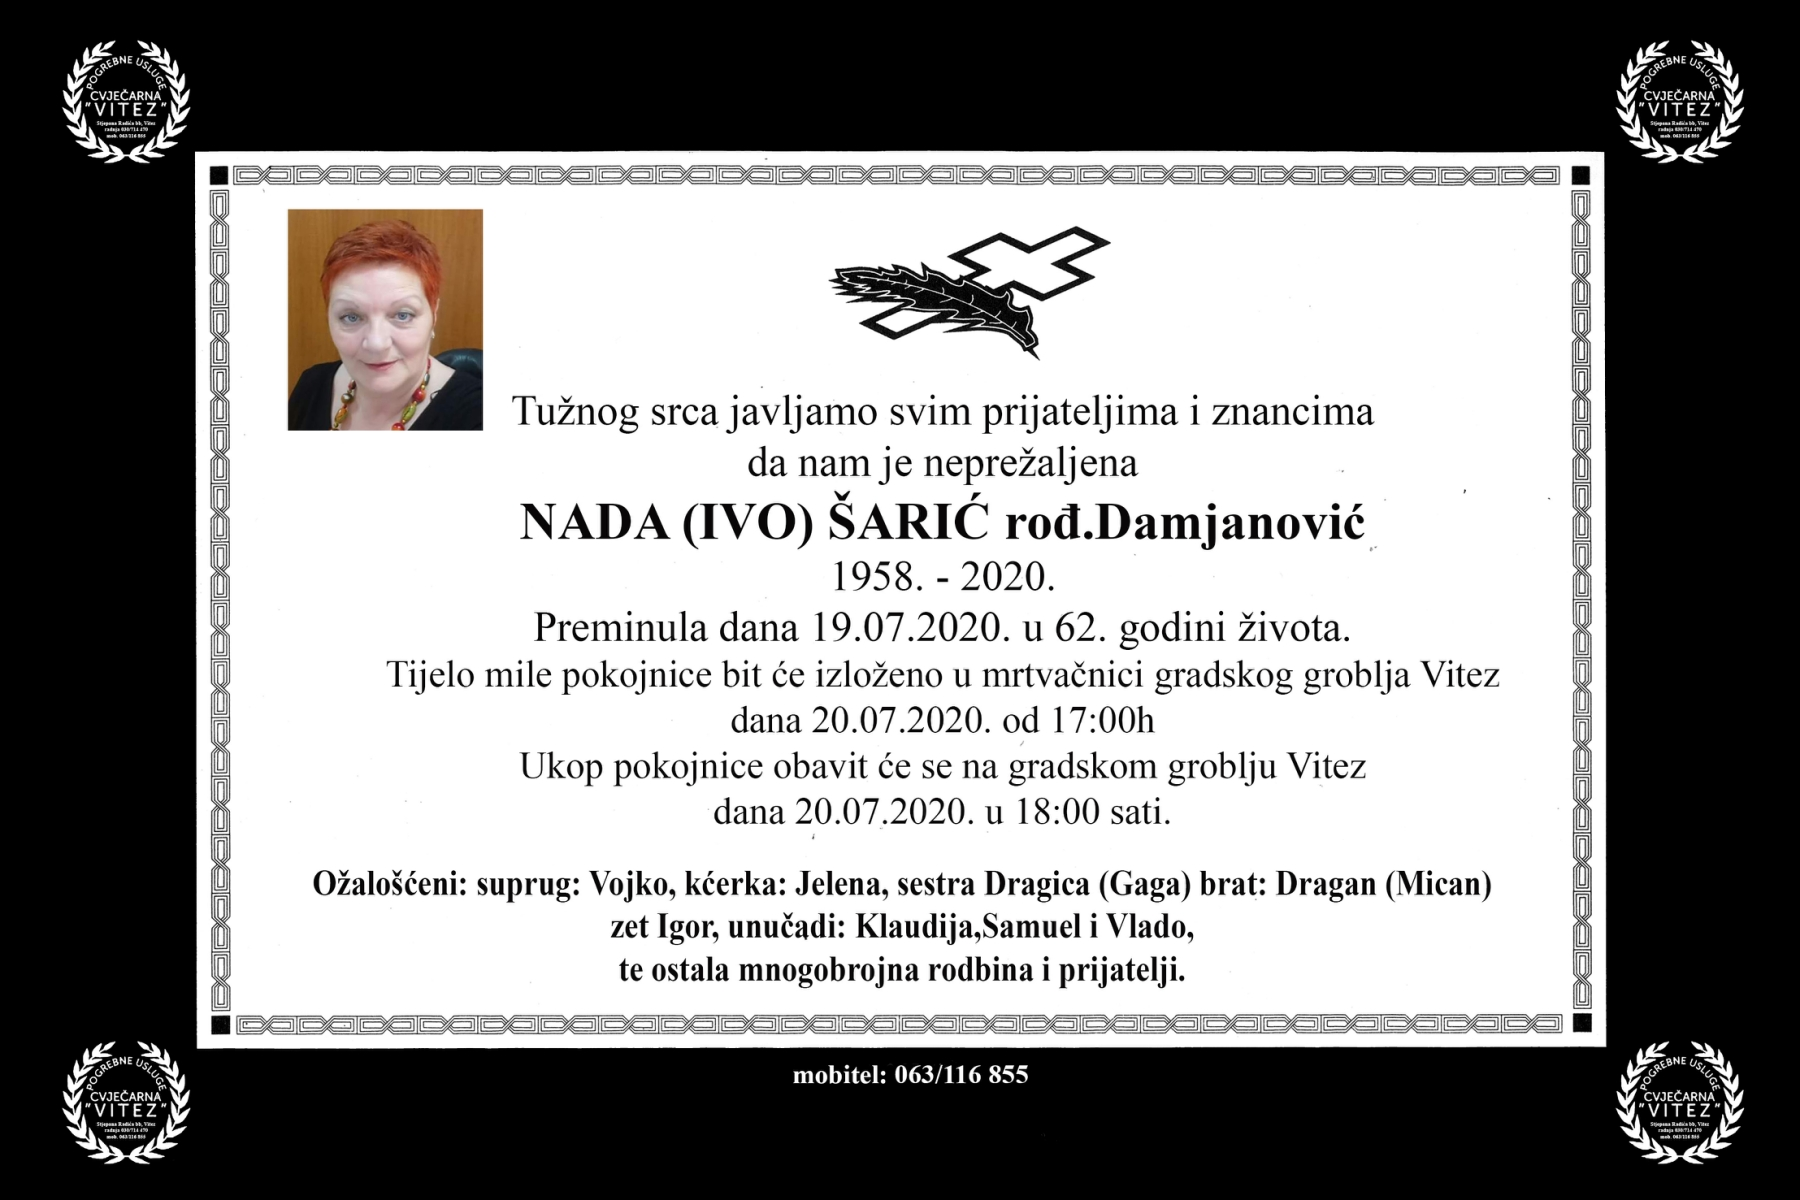 Nada (Ivo) Šarić rođ. Damjanović